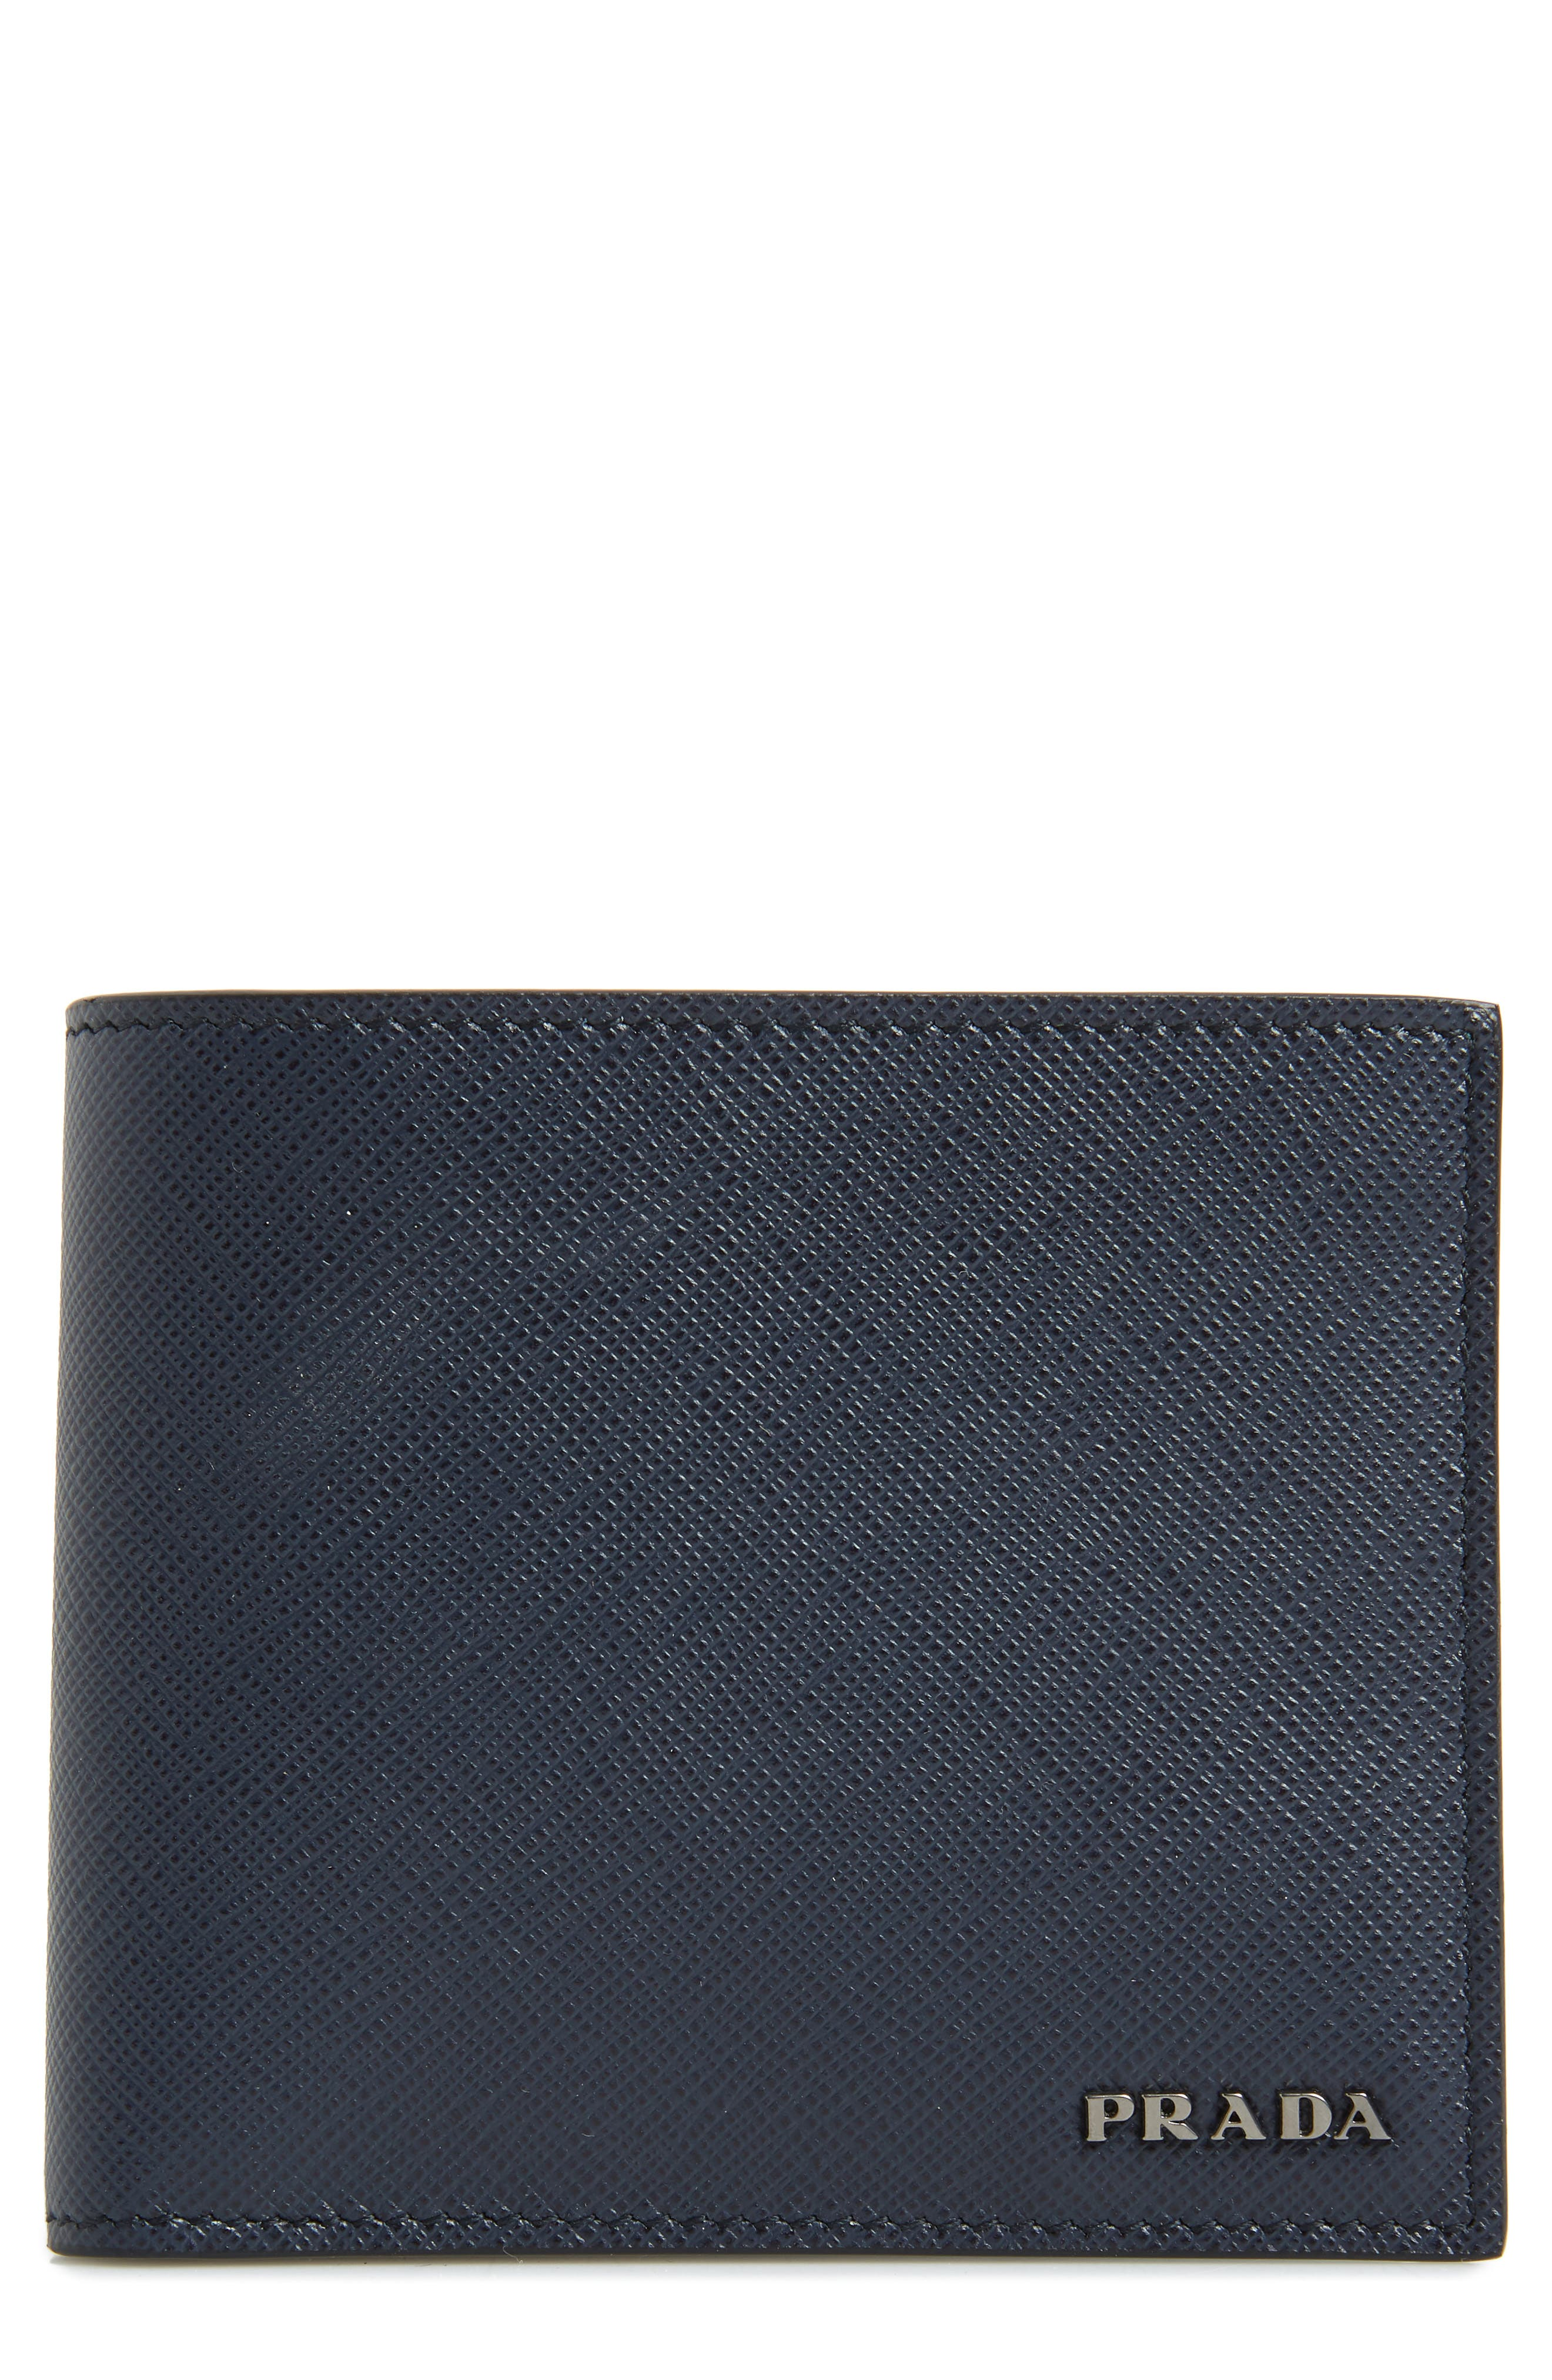 Bicolor Leather Wallet,                         Main,                         color, BLUE